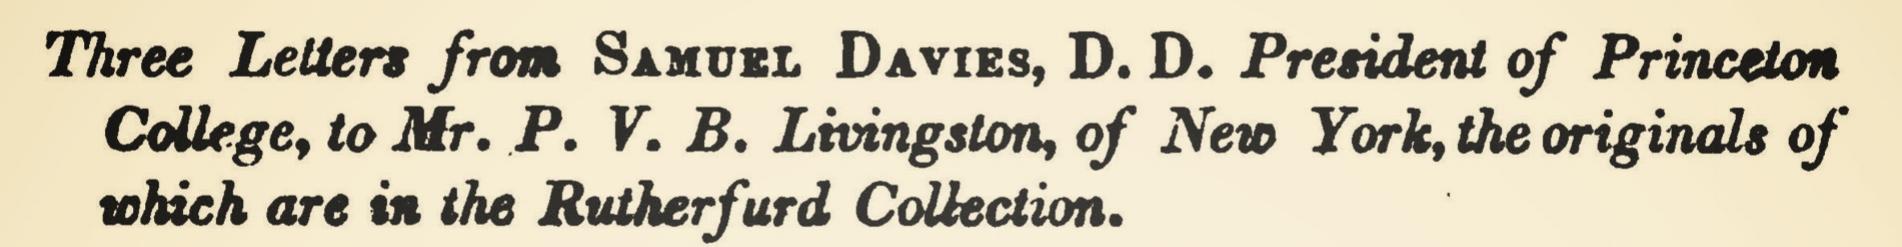 Davies, Samuel, Three Letters From Samuel Davies Title Page.jpg